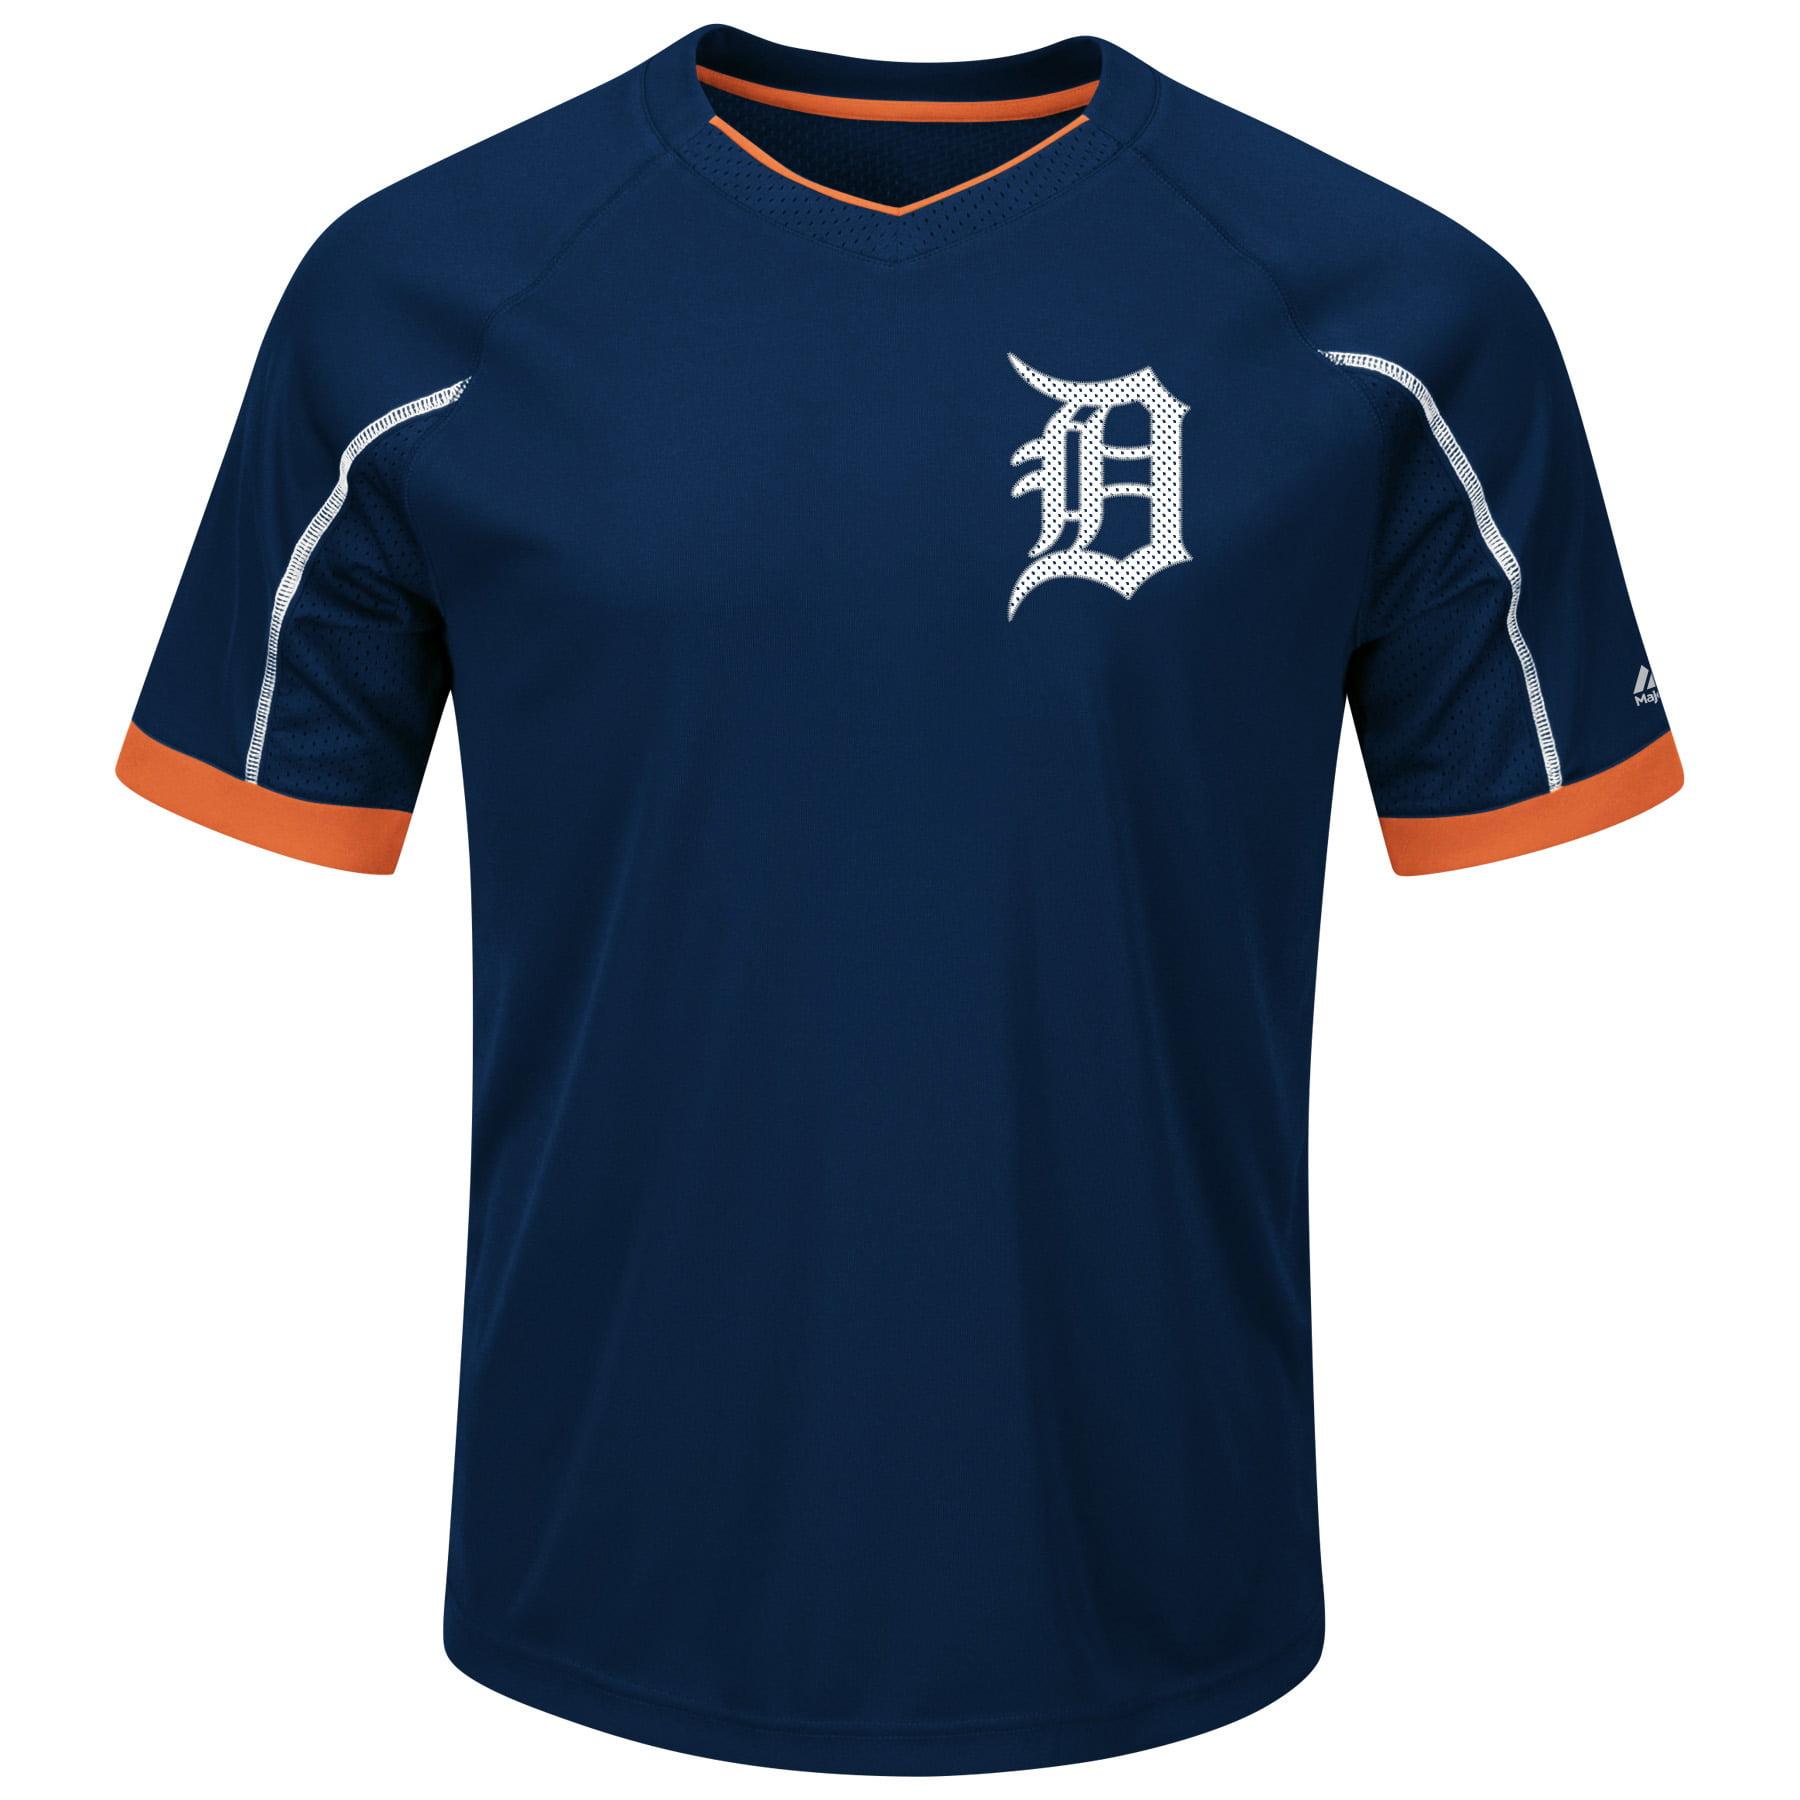 Detroit Tigers Majestic Big & Tall Emergence V-Neck T-Shirt Navy Orange by Profile